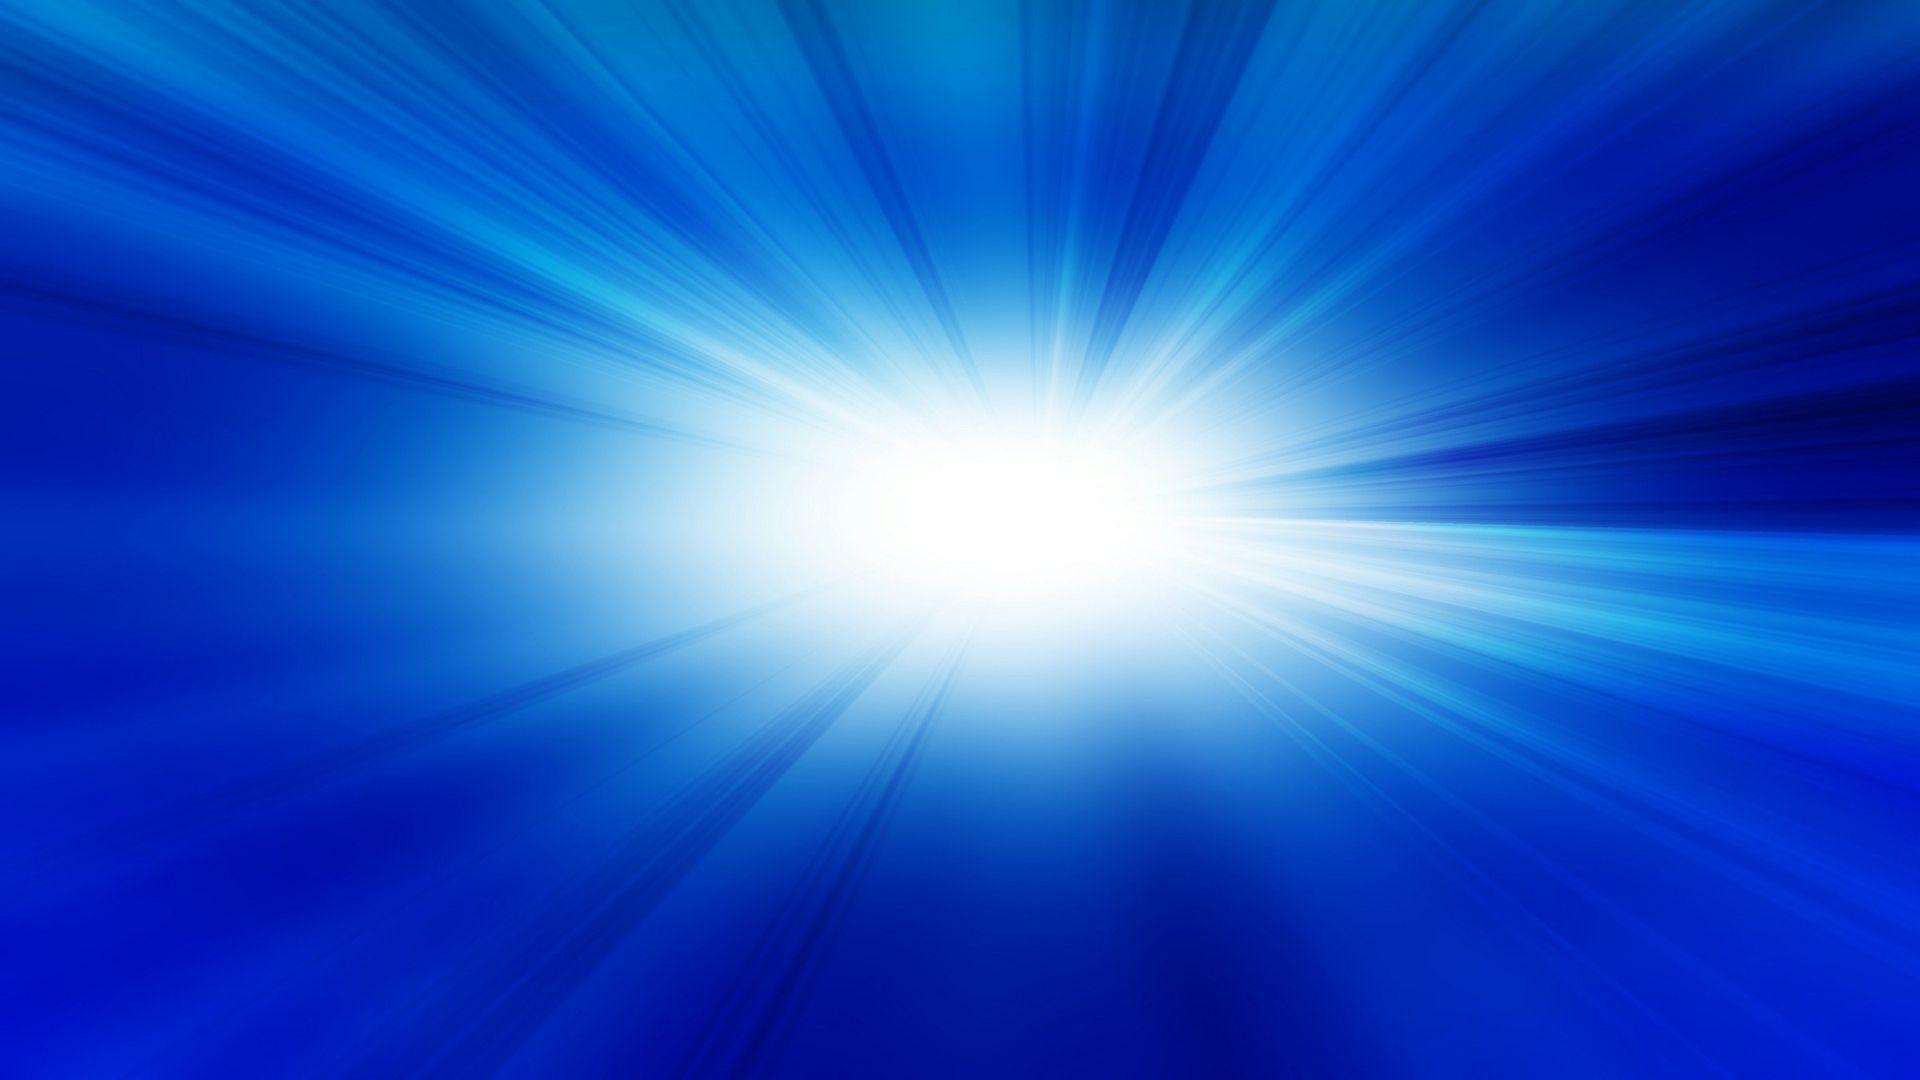 Light Effect Hd Wallpaper Background Images: Blue Backgrounds